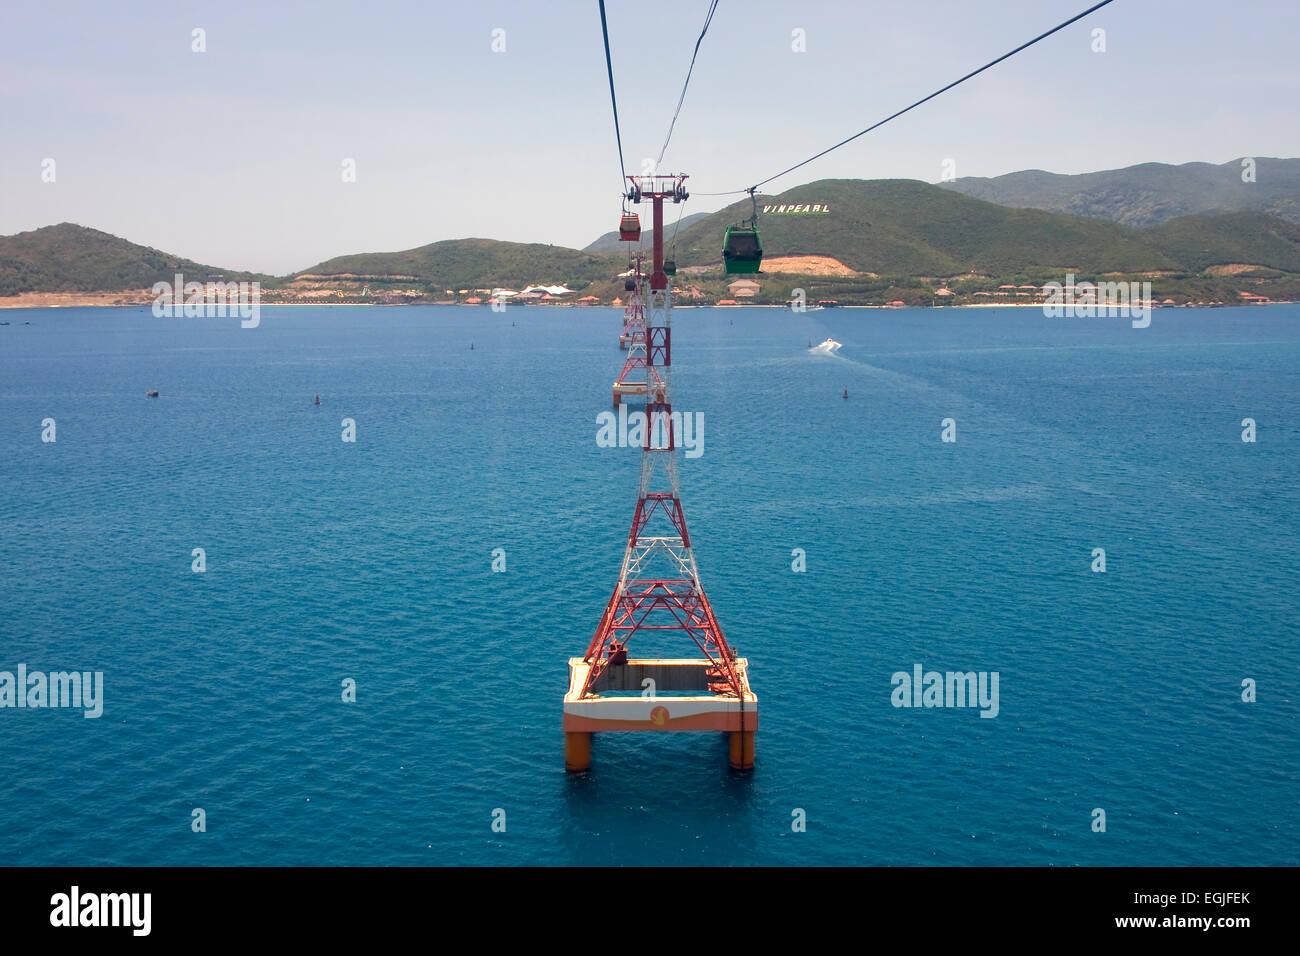 Island Vinpearl Nha trang, Vietnam, Asia - Stock Image